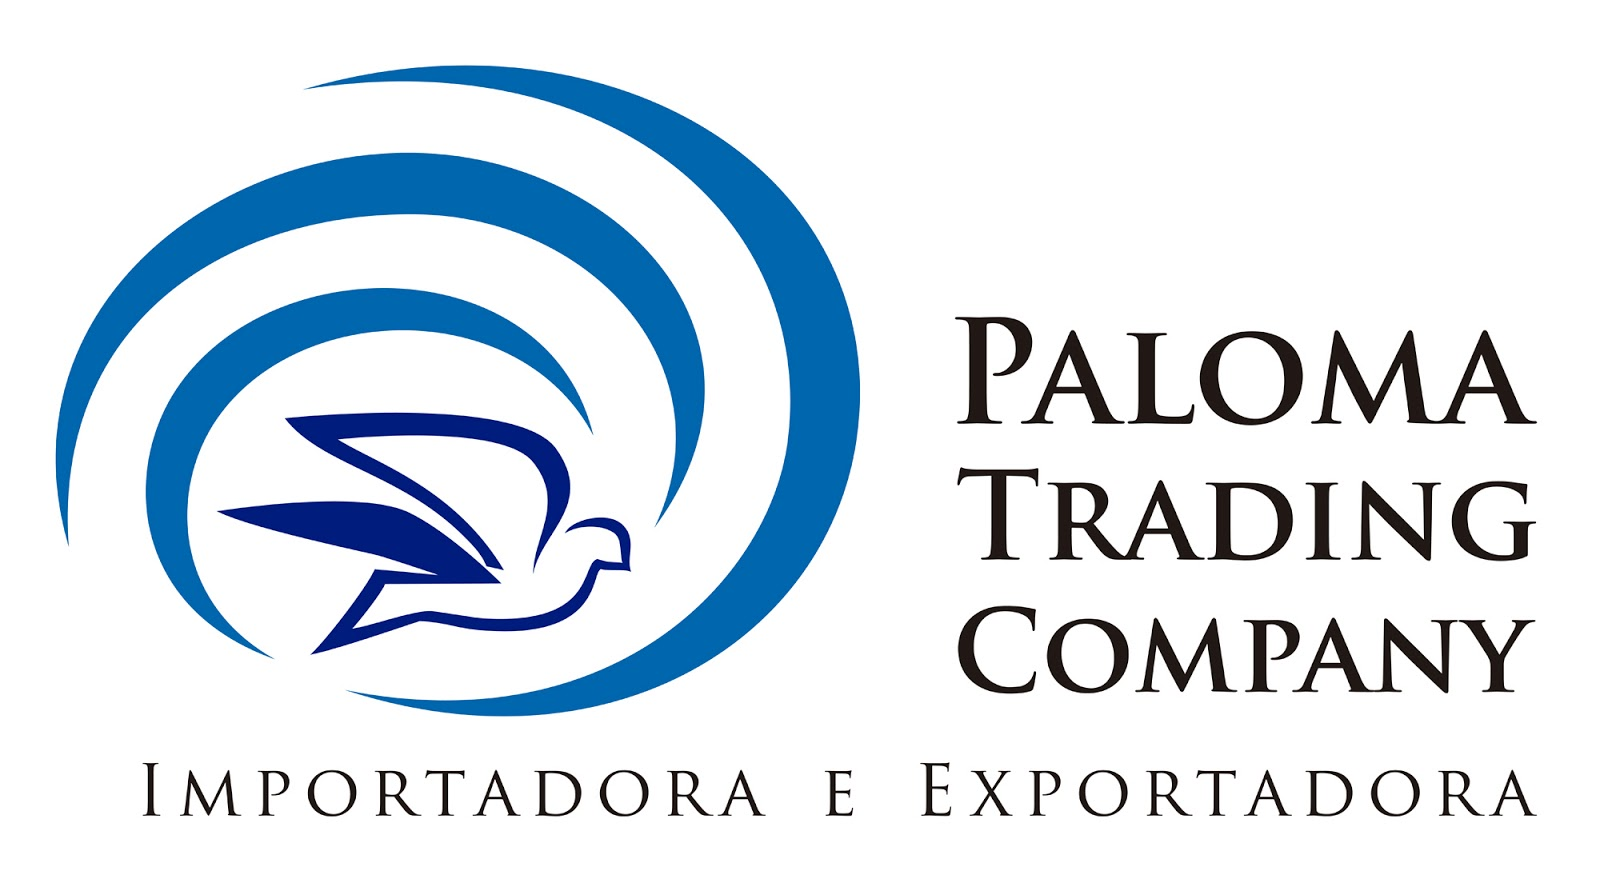 Paloma trading company logo keith dalmon for Trading group